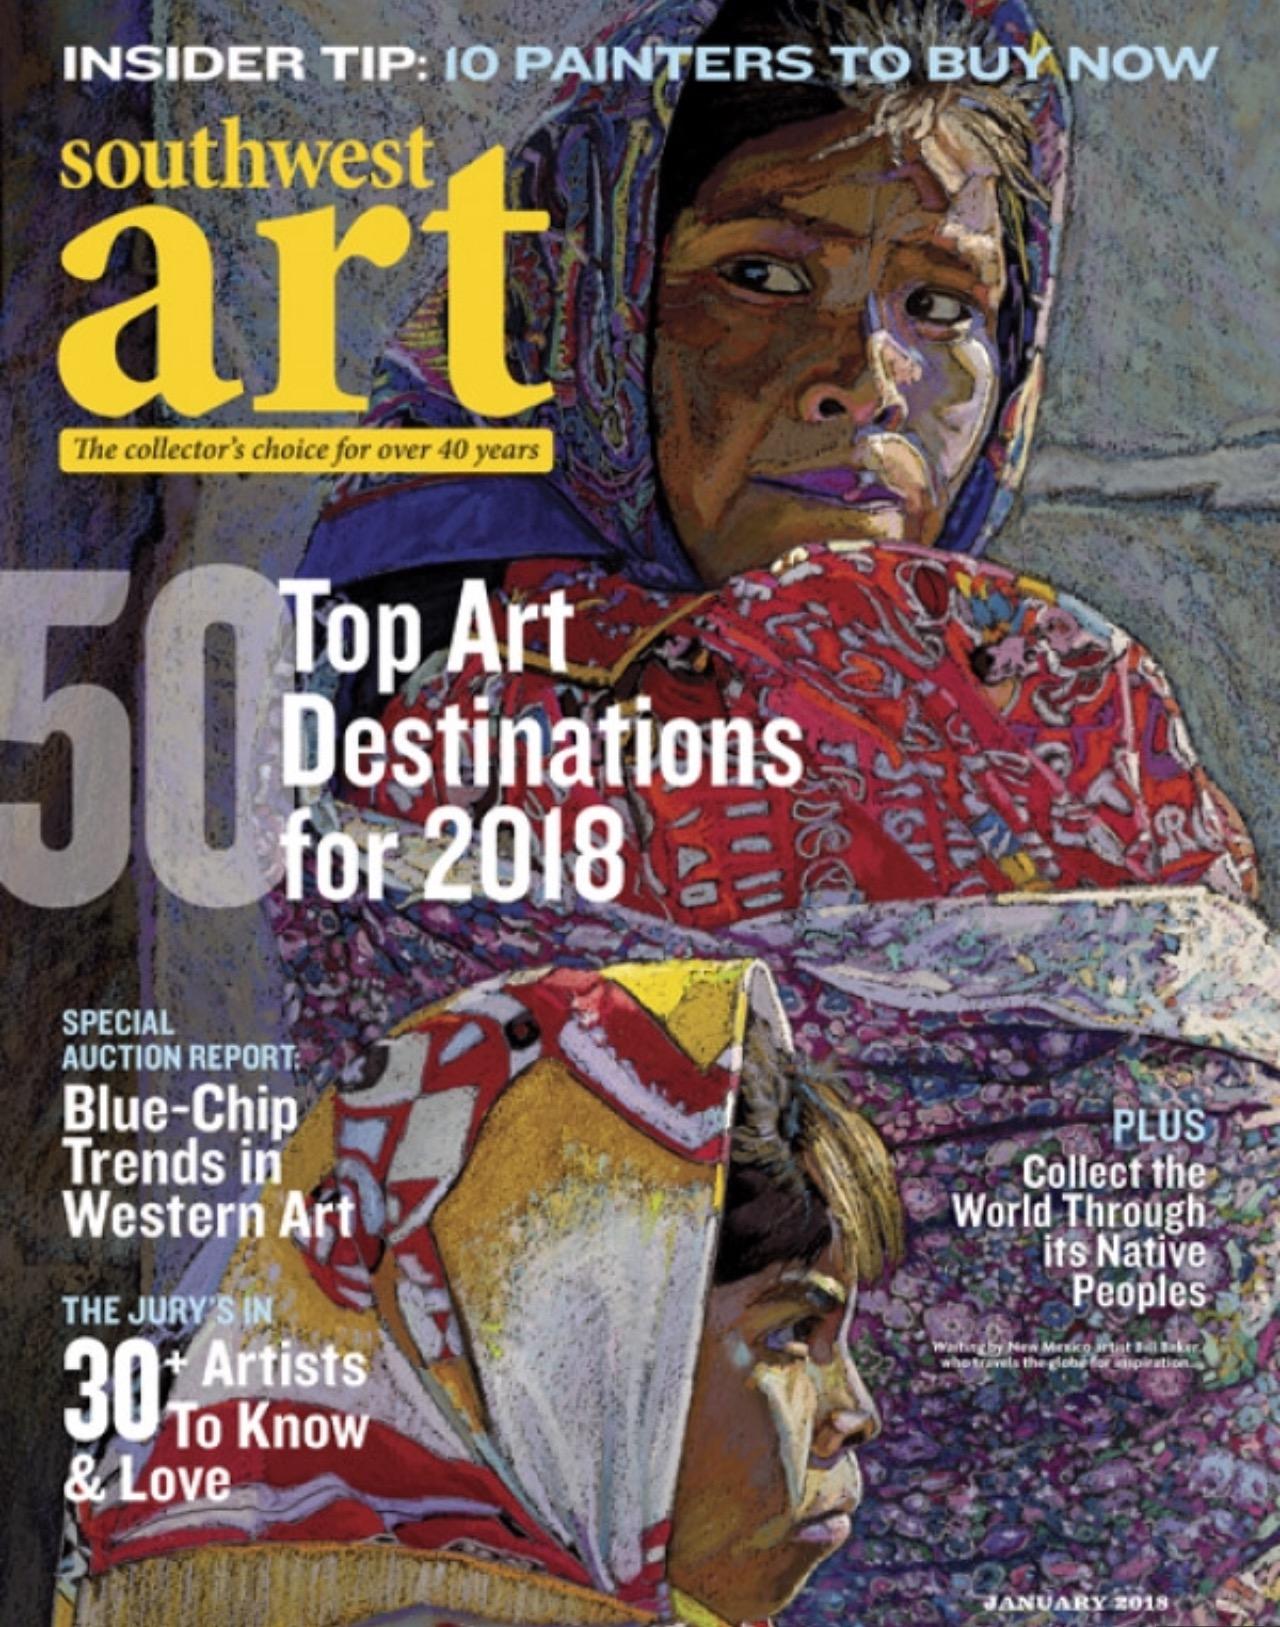 Southwest Art - Emerging Artists | Melinda LittlejohnDecember 15th, 2017